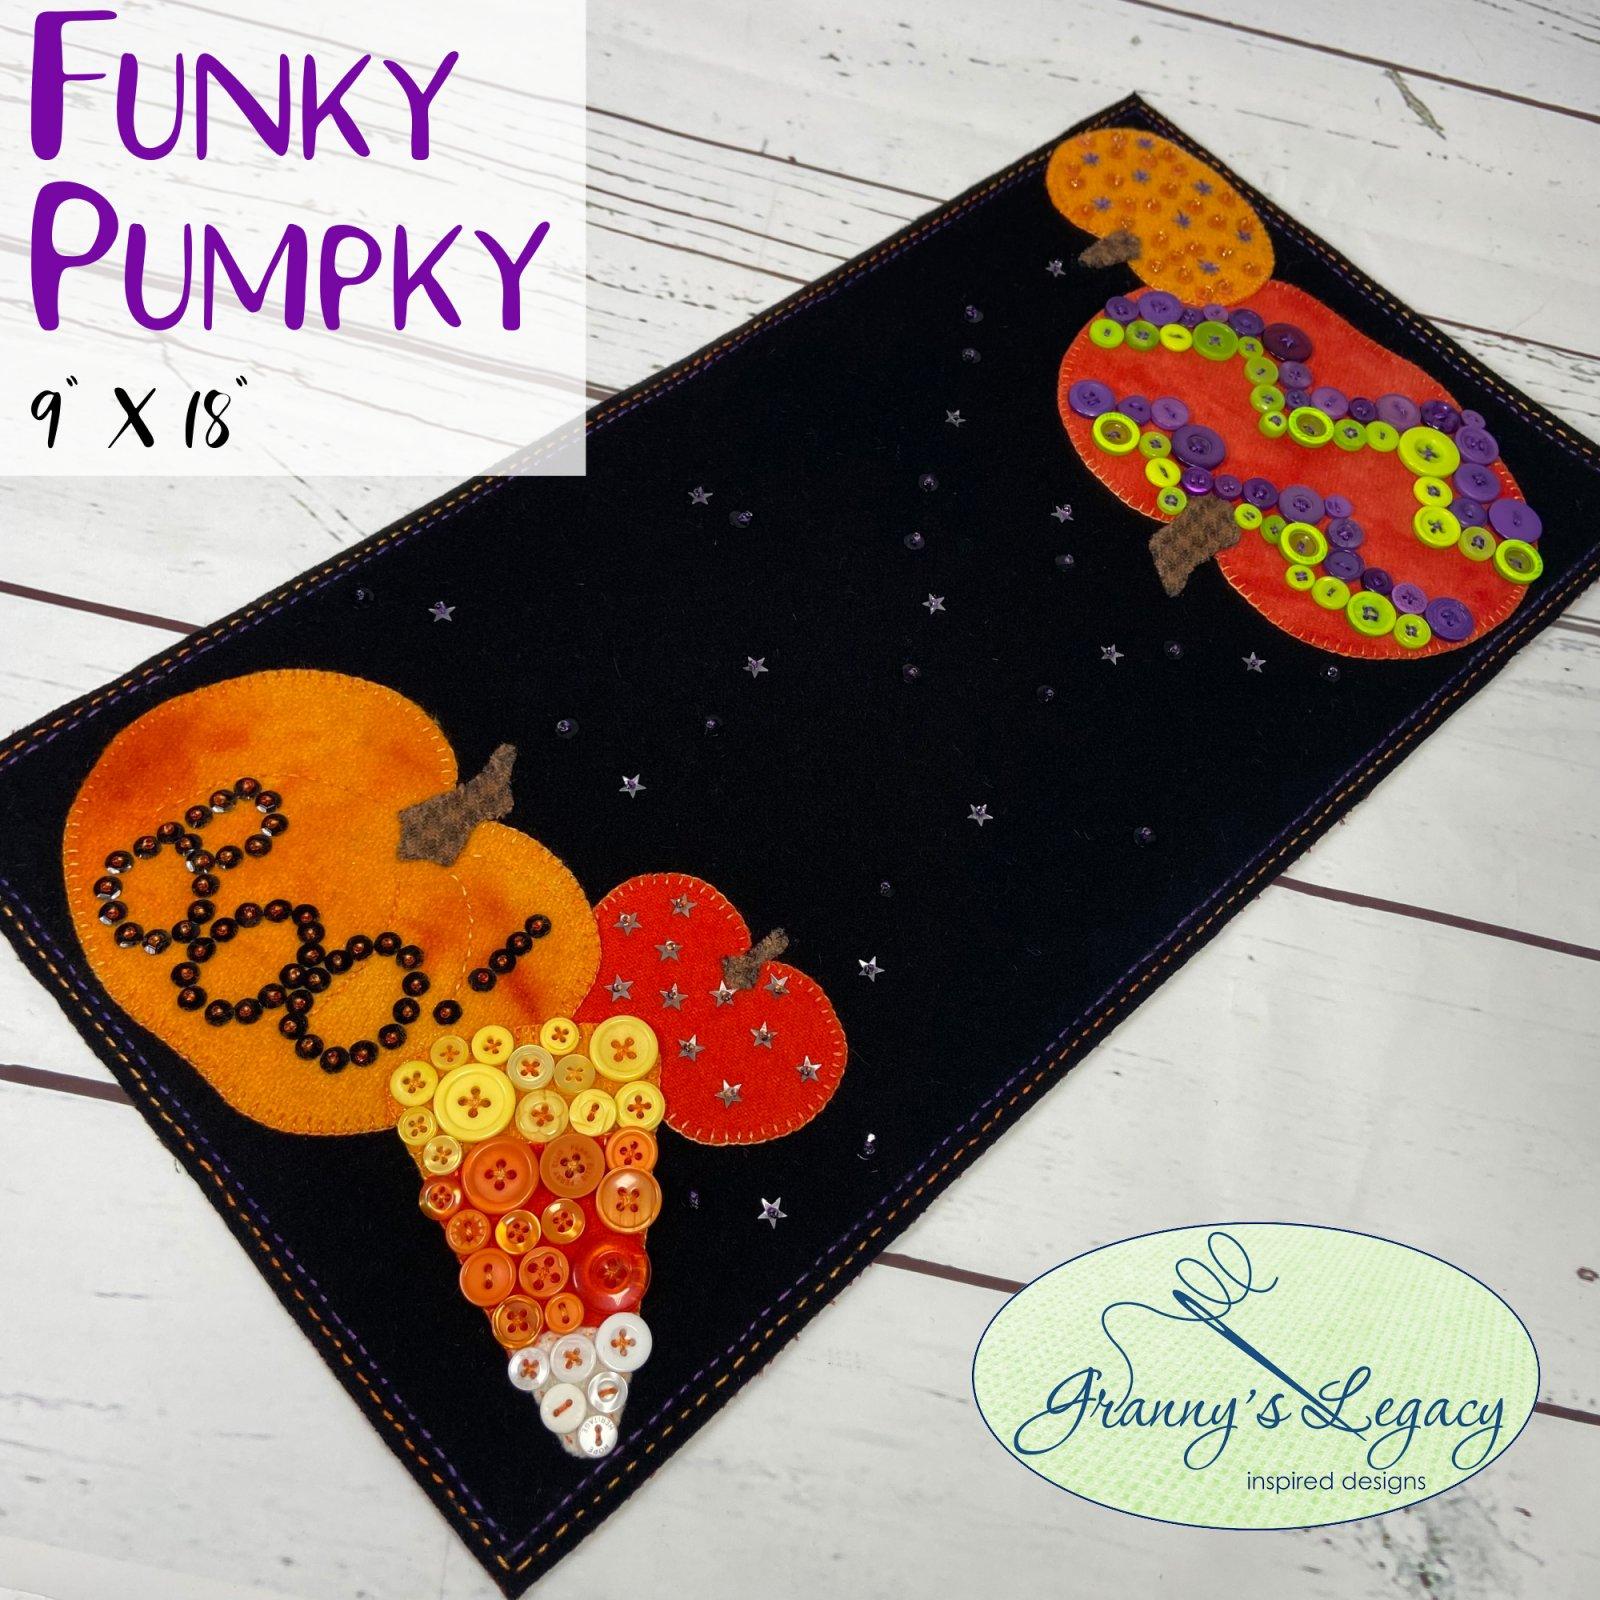 Funky Pumpky